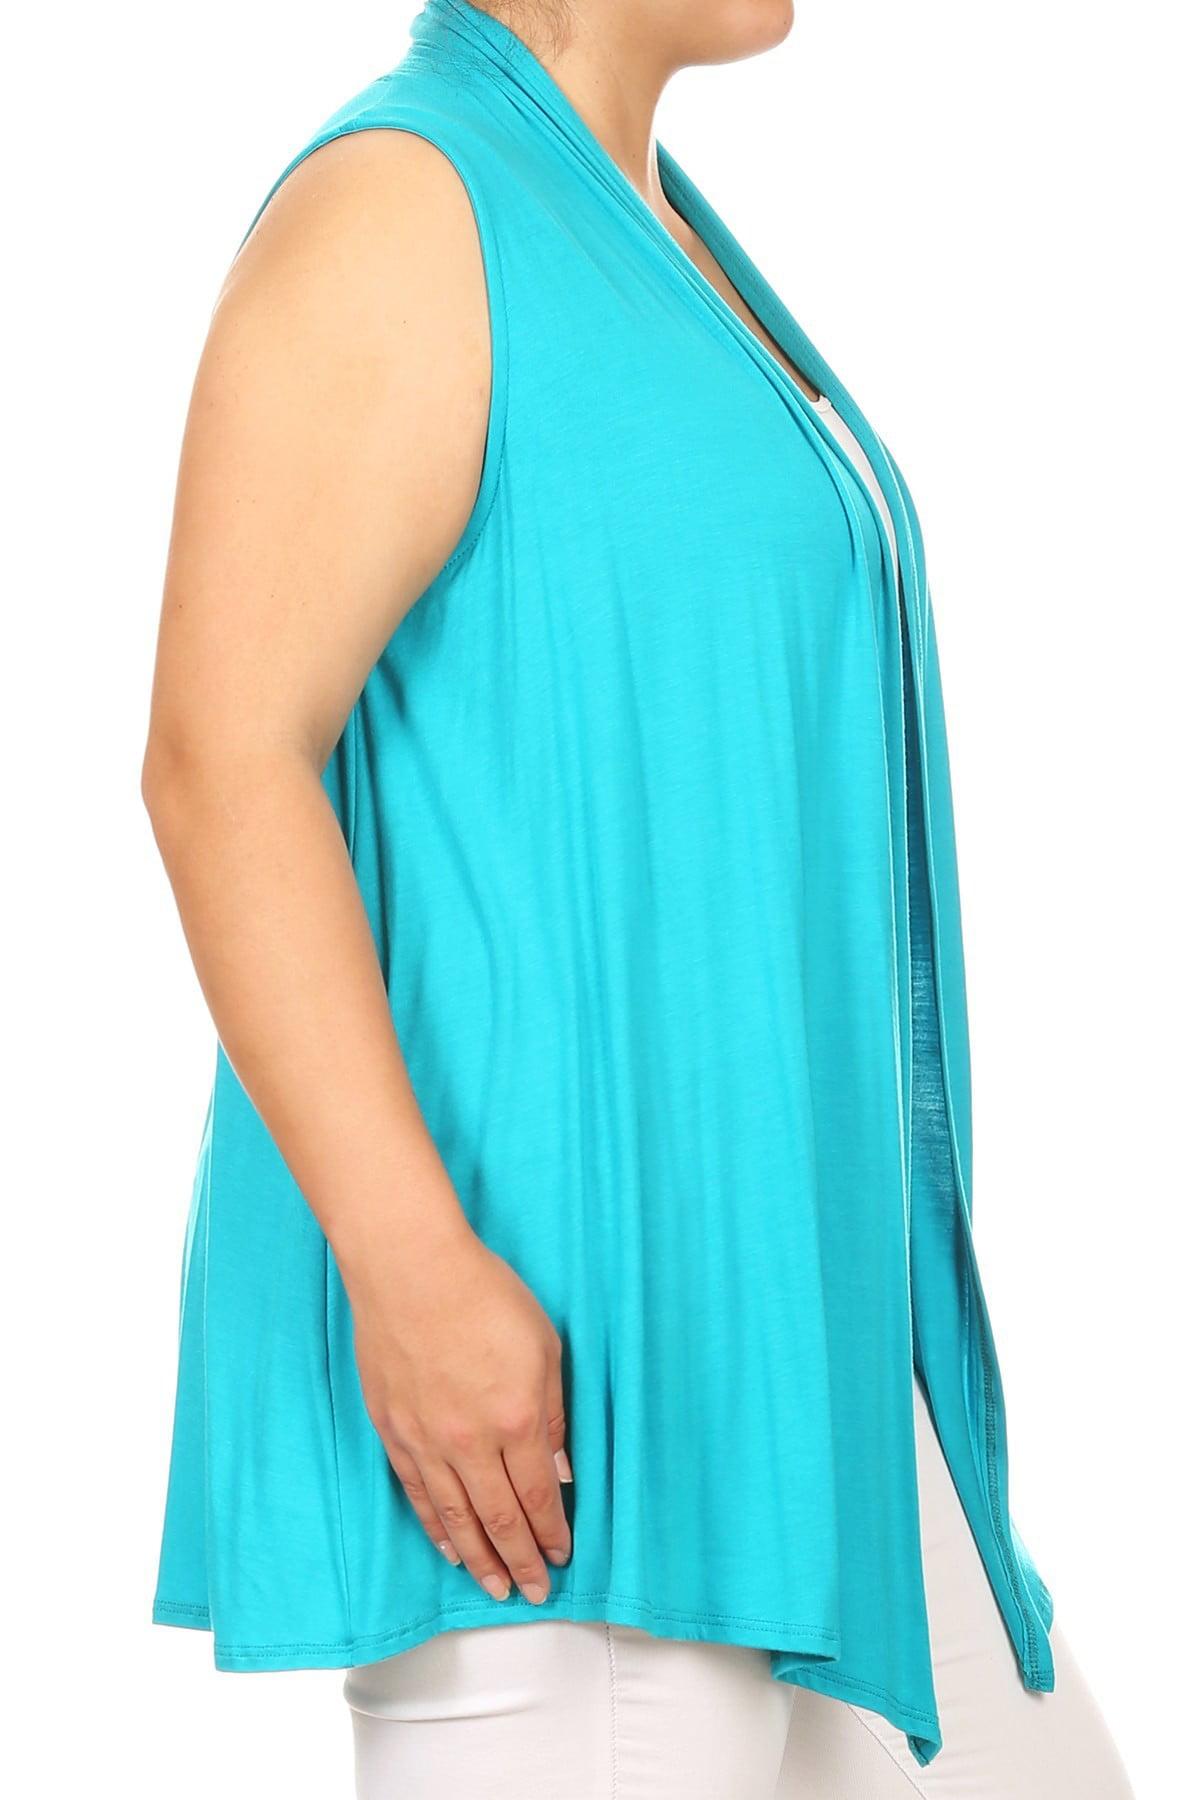 52f1432b6481df BNY Corner - BNY Corner Women Plus Size Sleeveless Cardigan Open Front  Casual Vest Cover Up Jade 1X 622 SD BNY Corner - Walmart.com